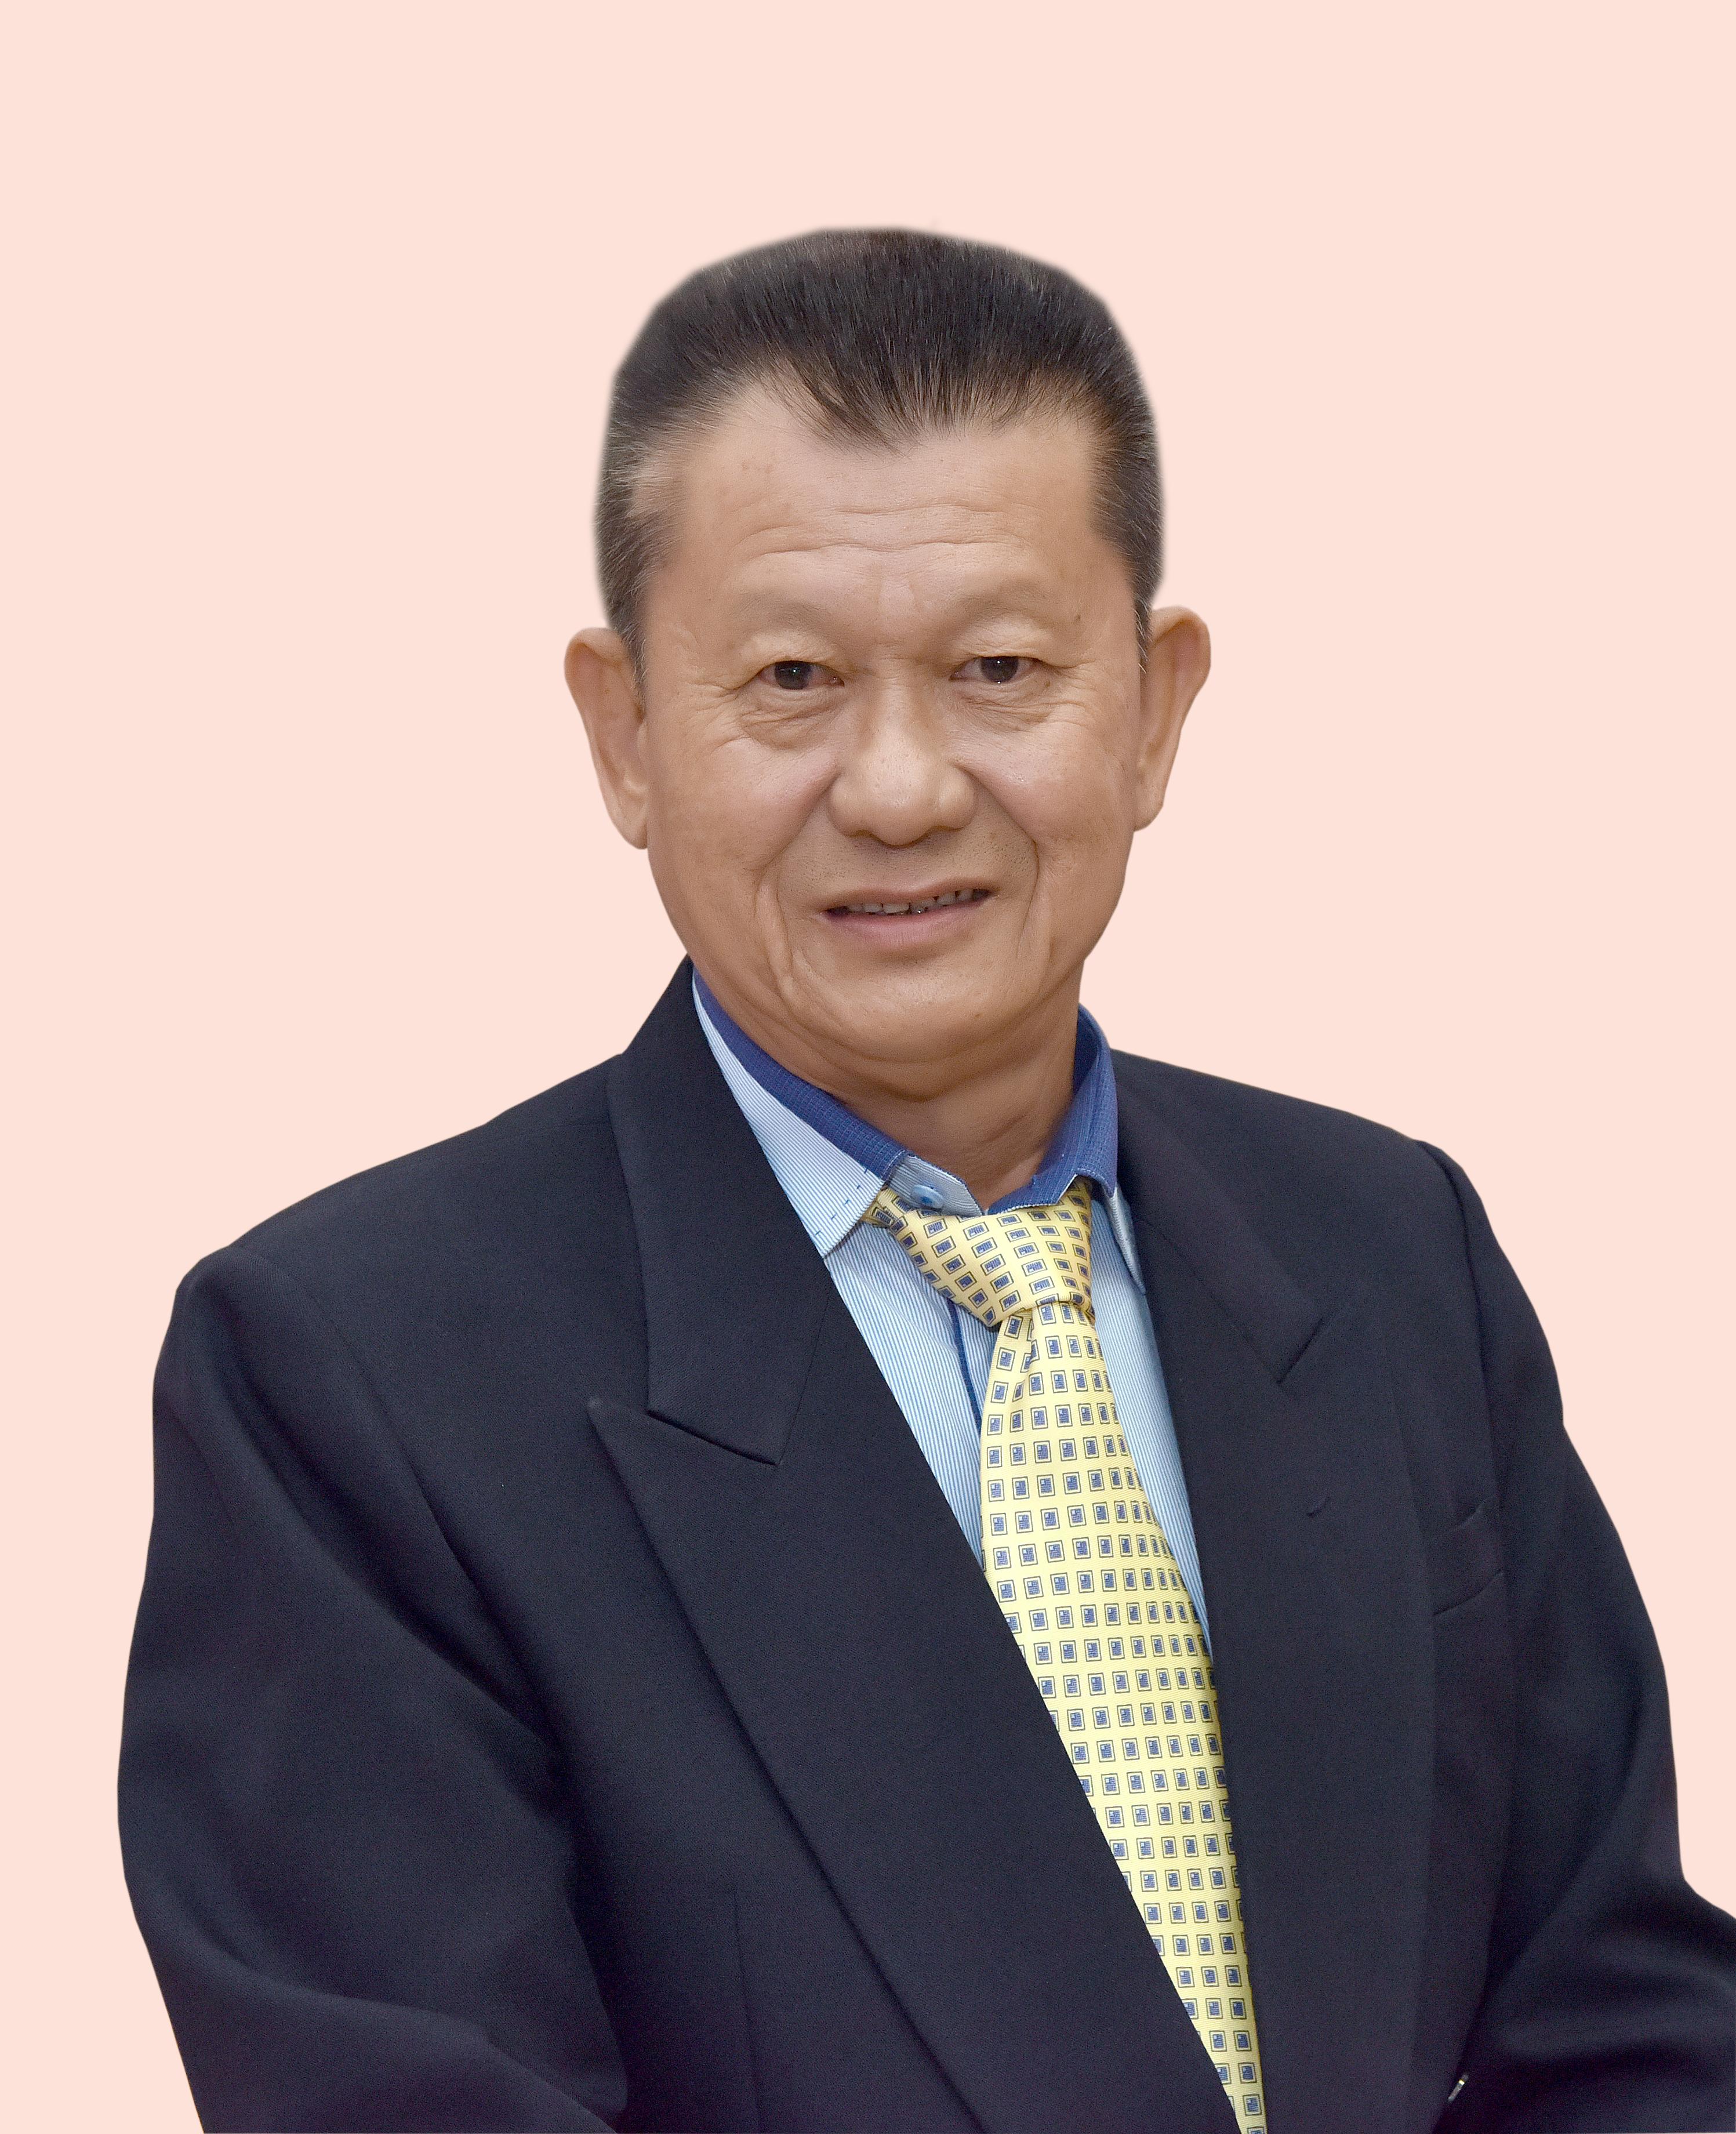 <h80>林琯福</h80><br>Henry Lim Kon Fook